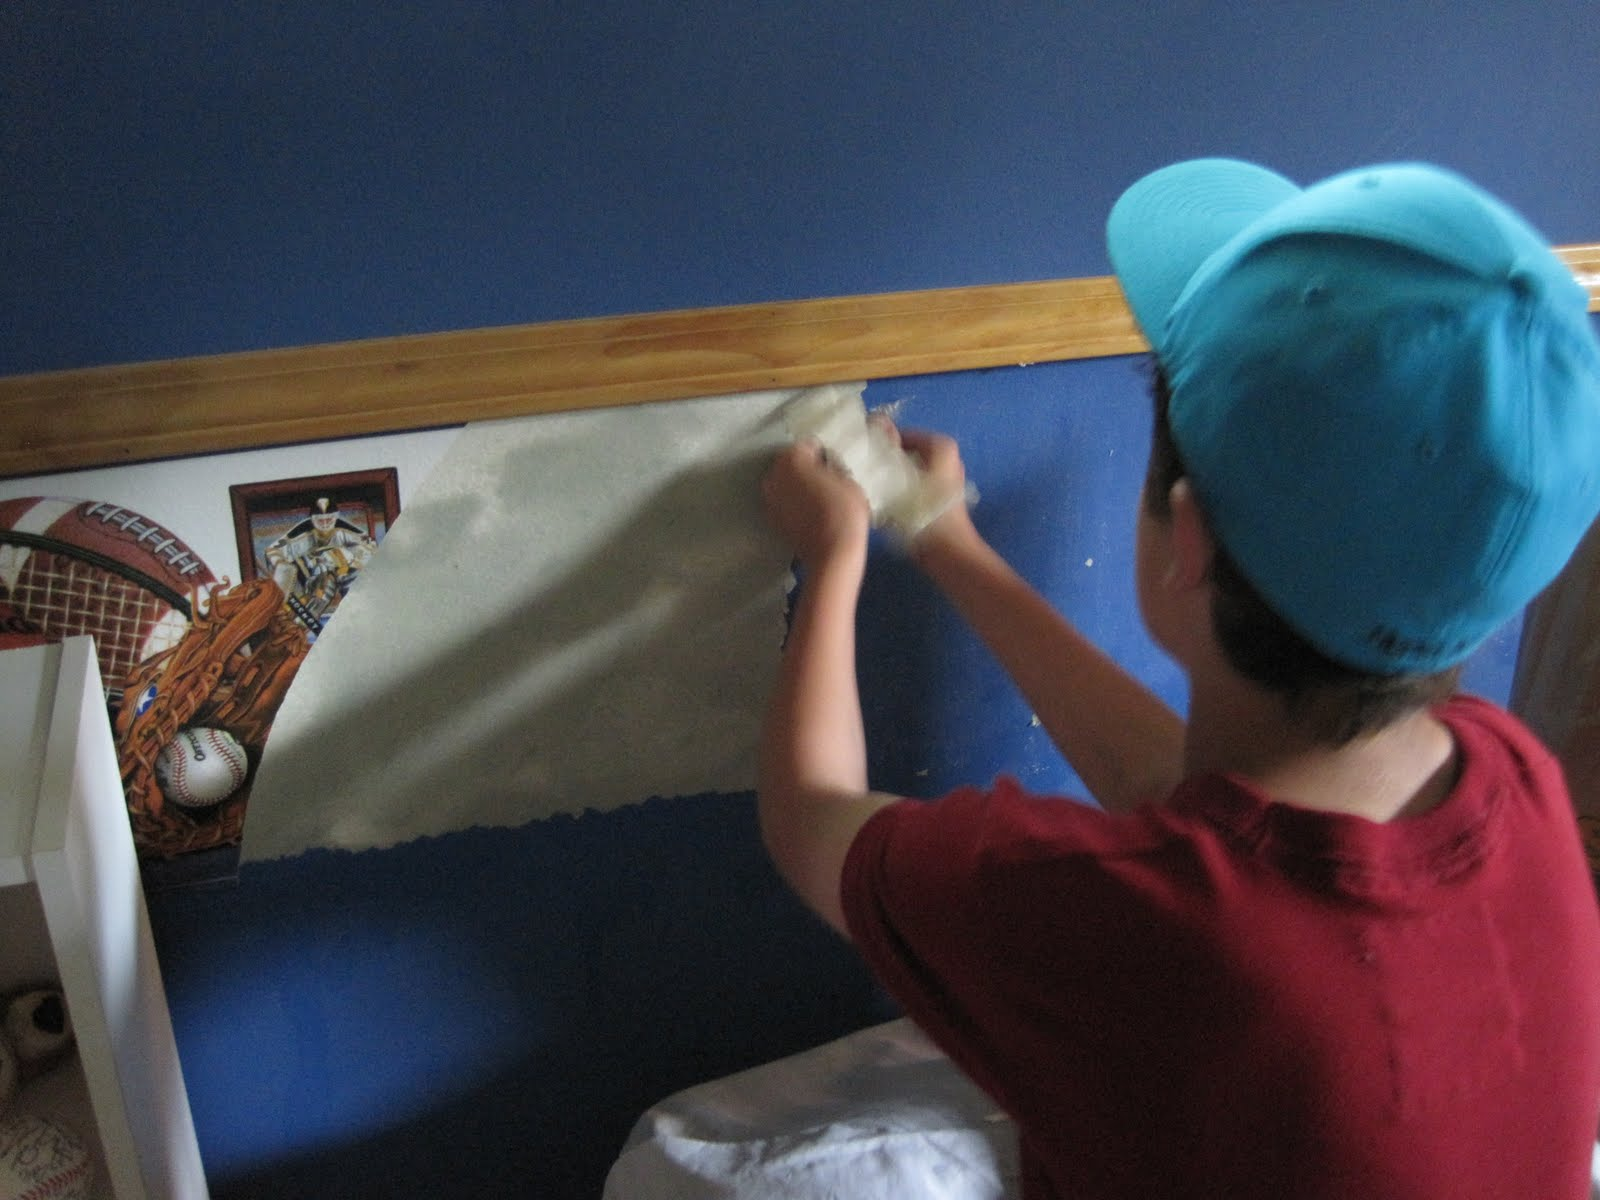 49+ Piranha Wallpaper and Paste Remover on WallpaperSafari